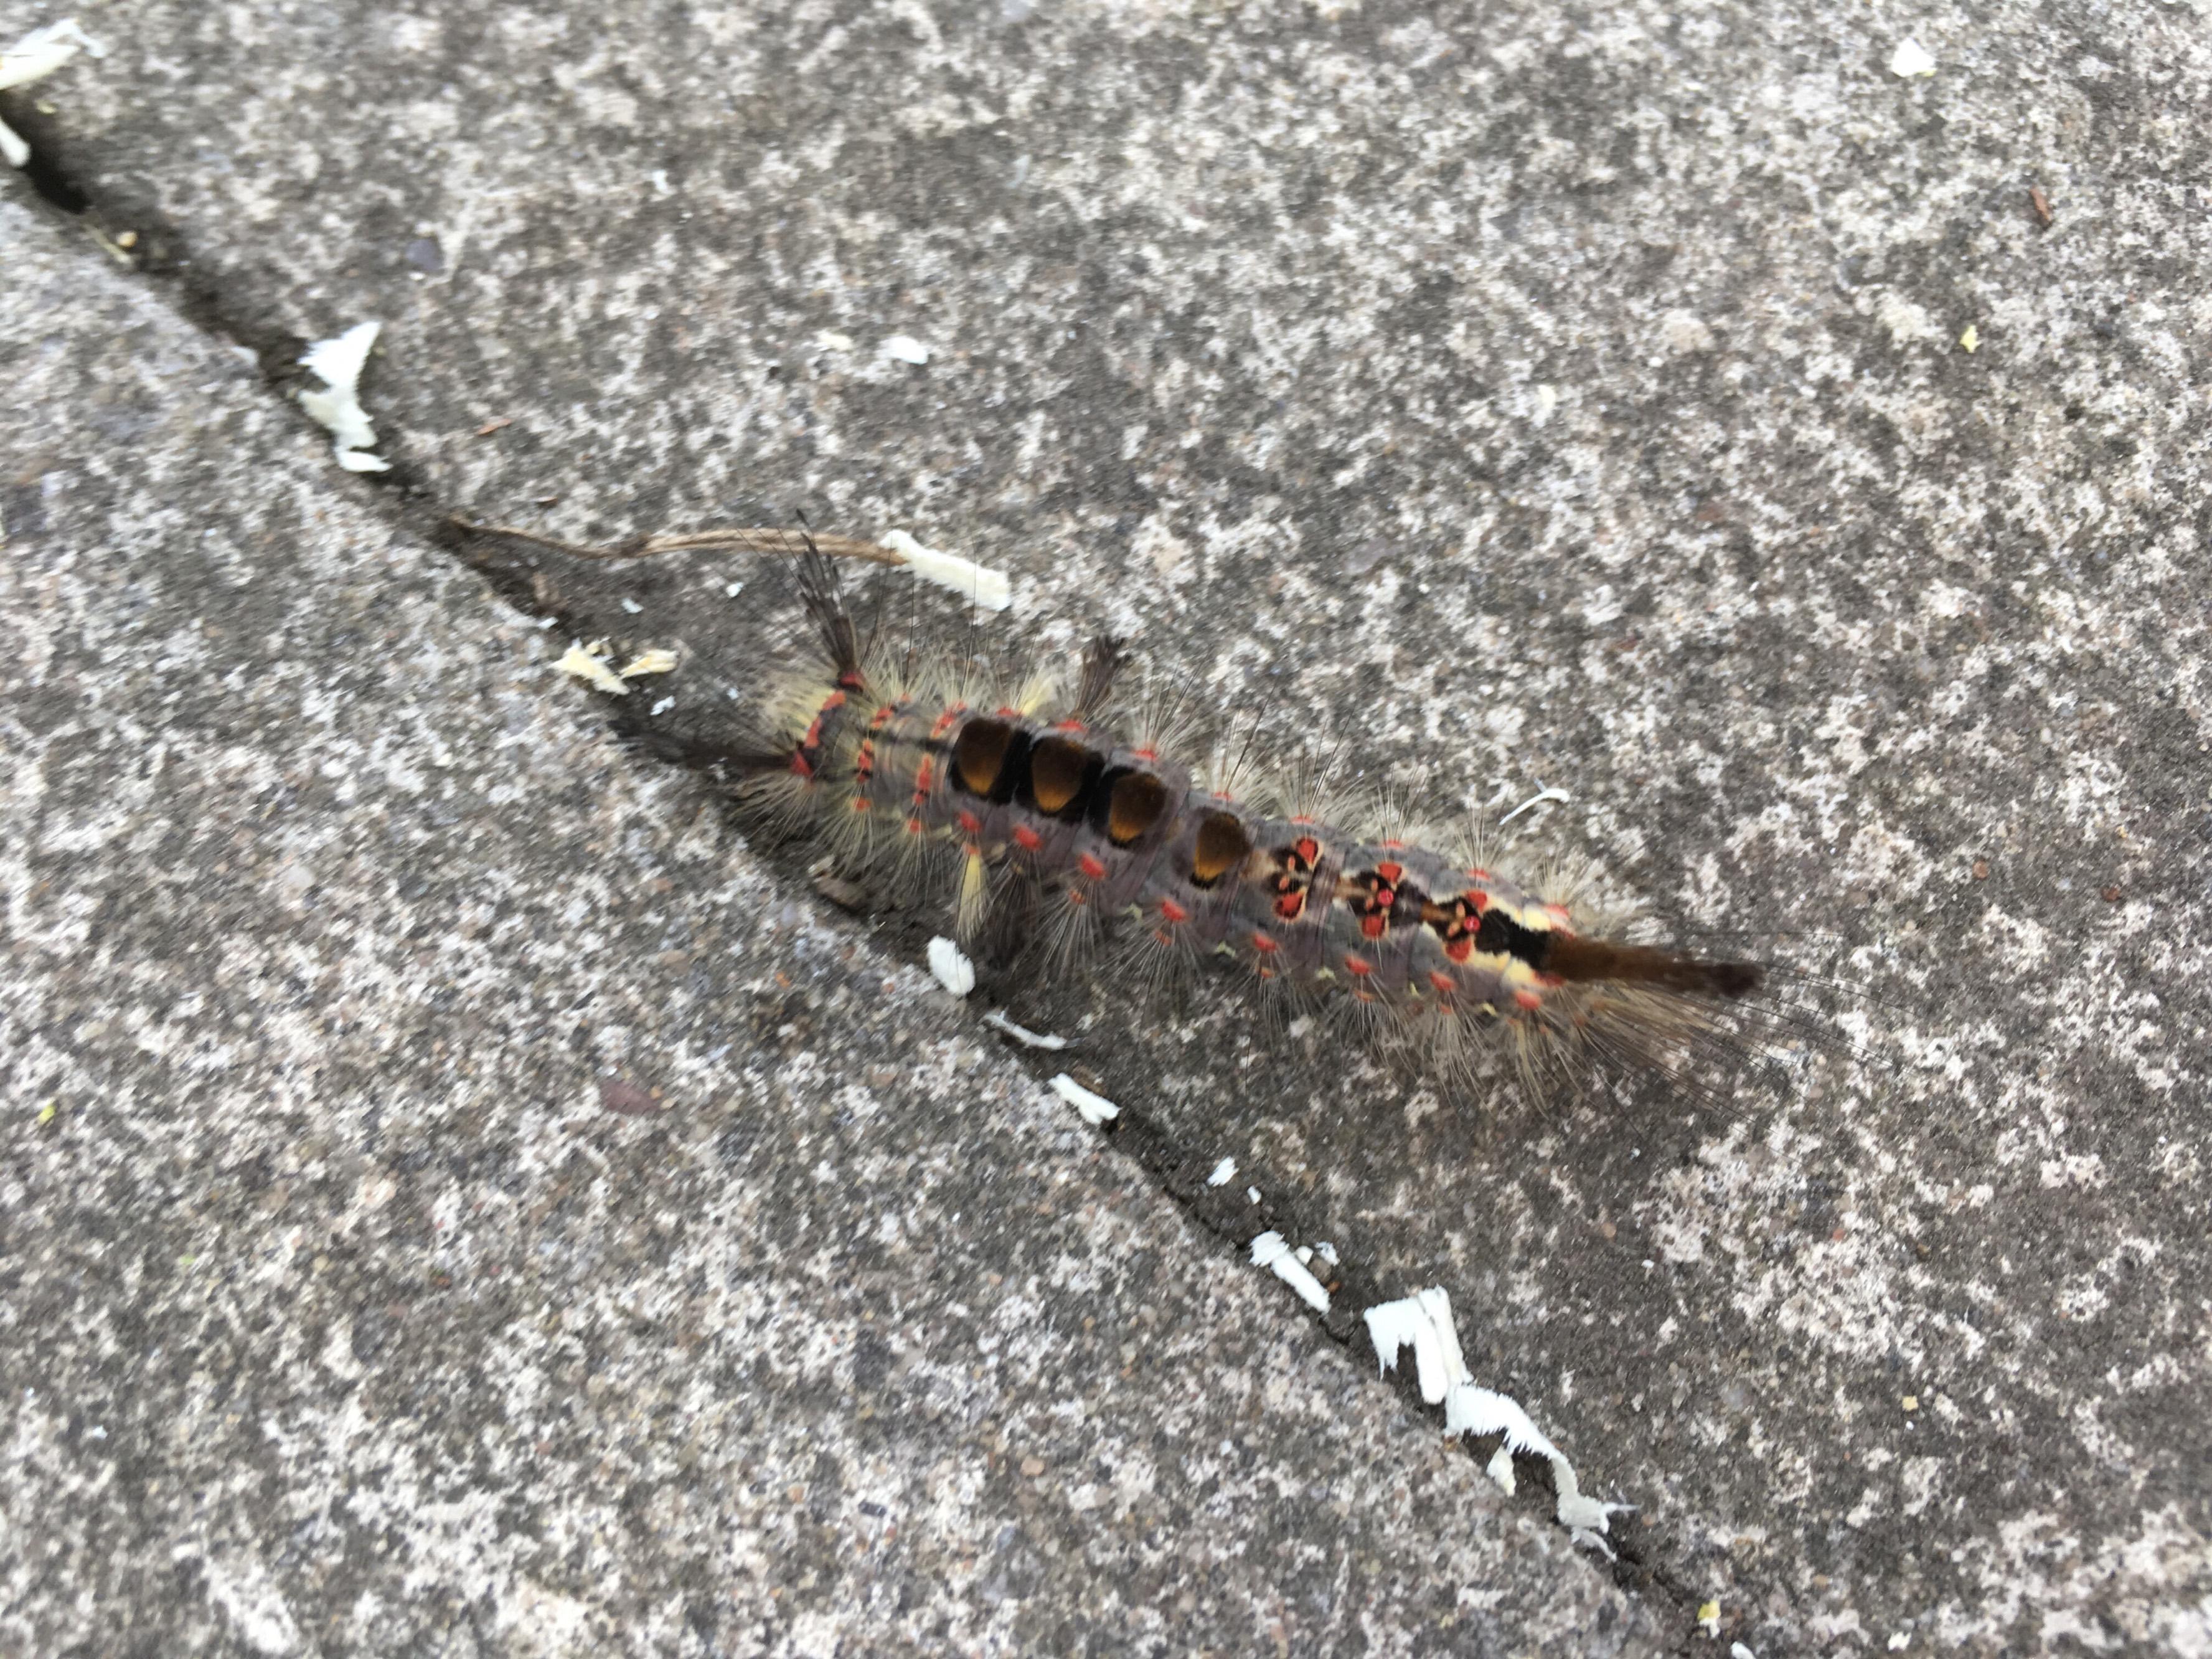 Furry caterpillar - Tree health care - Arbtalk | The Social Network